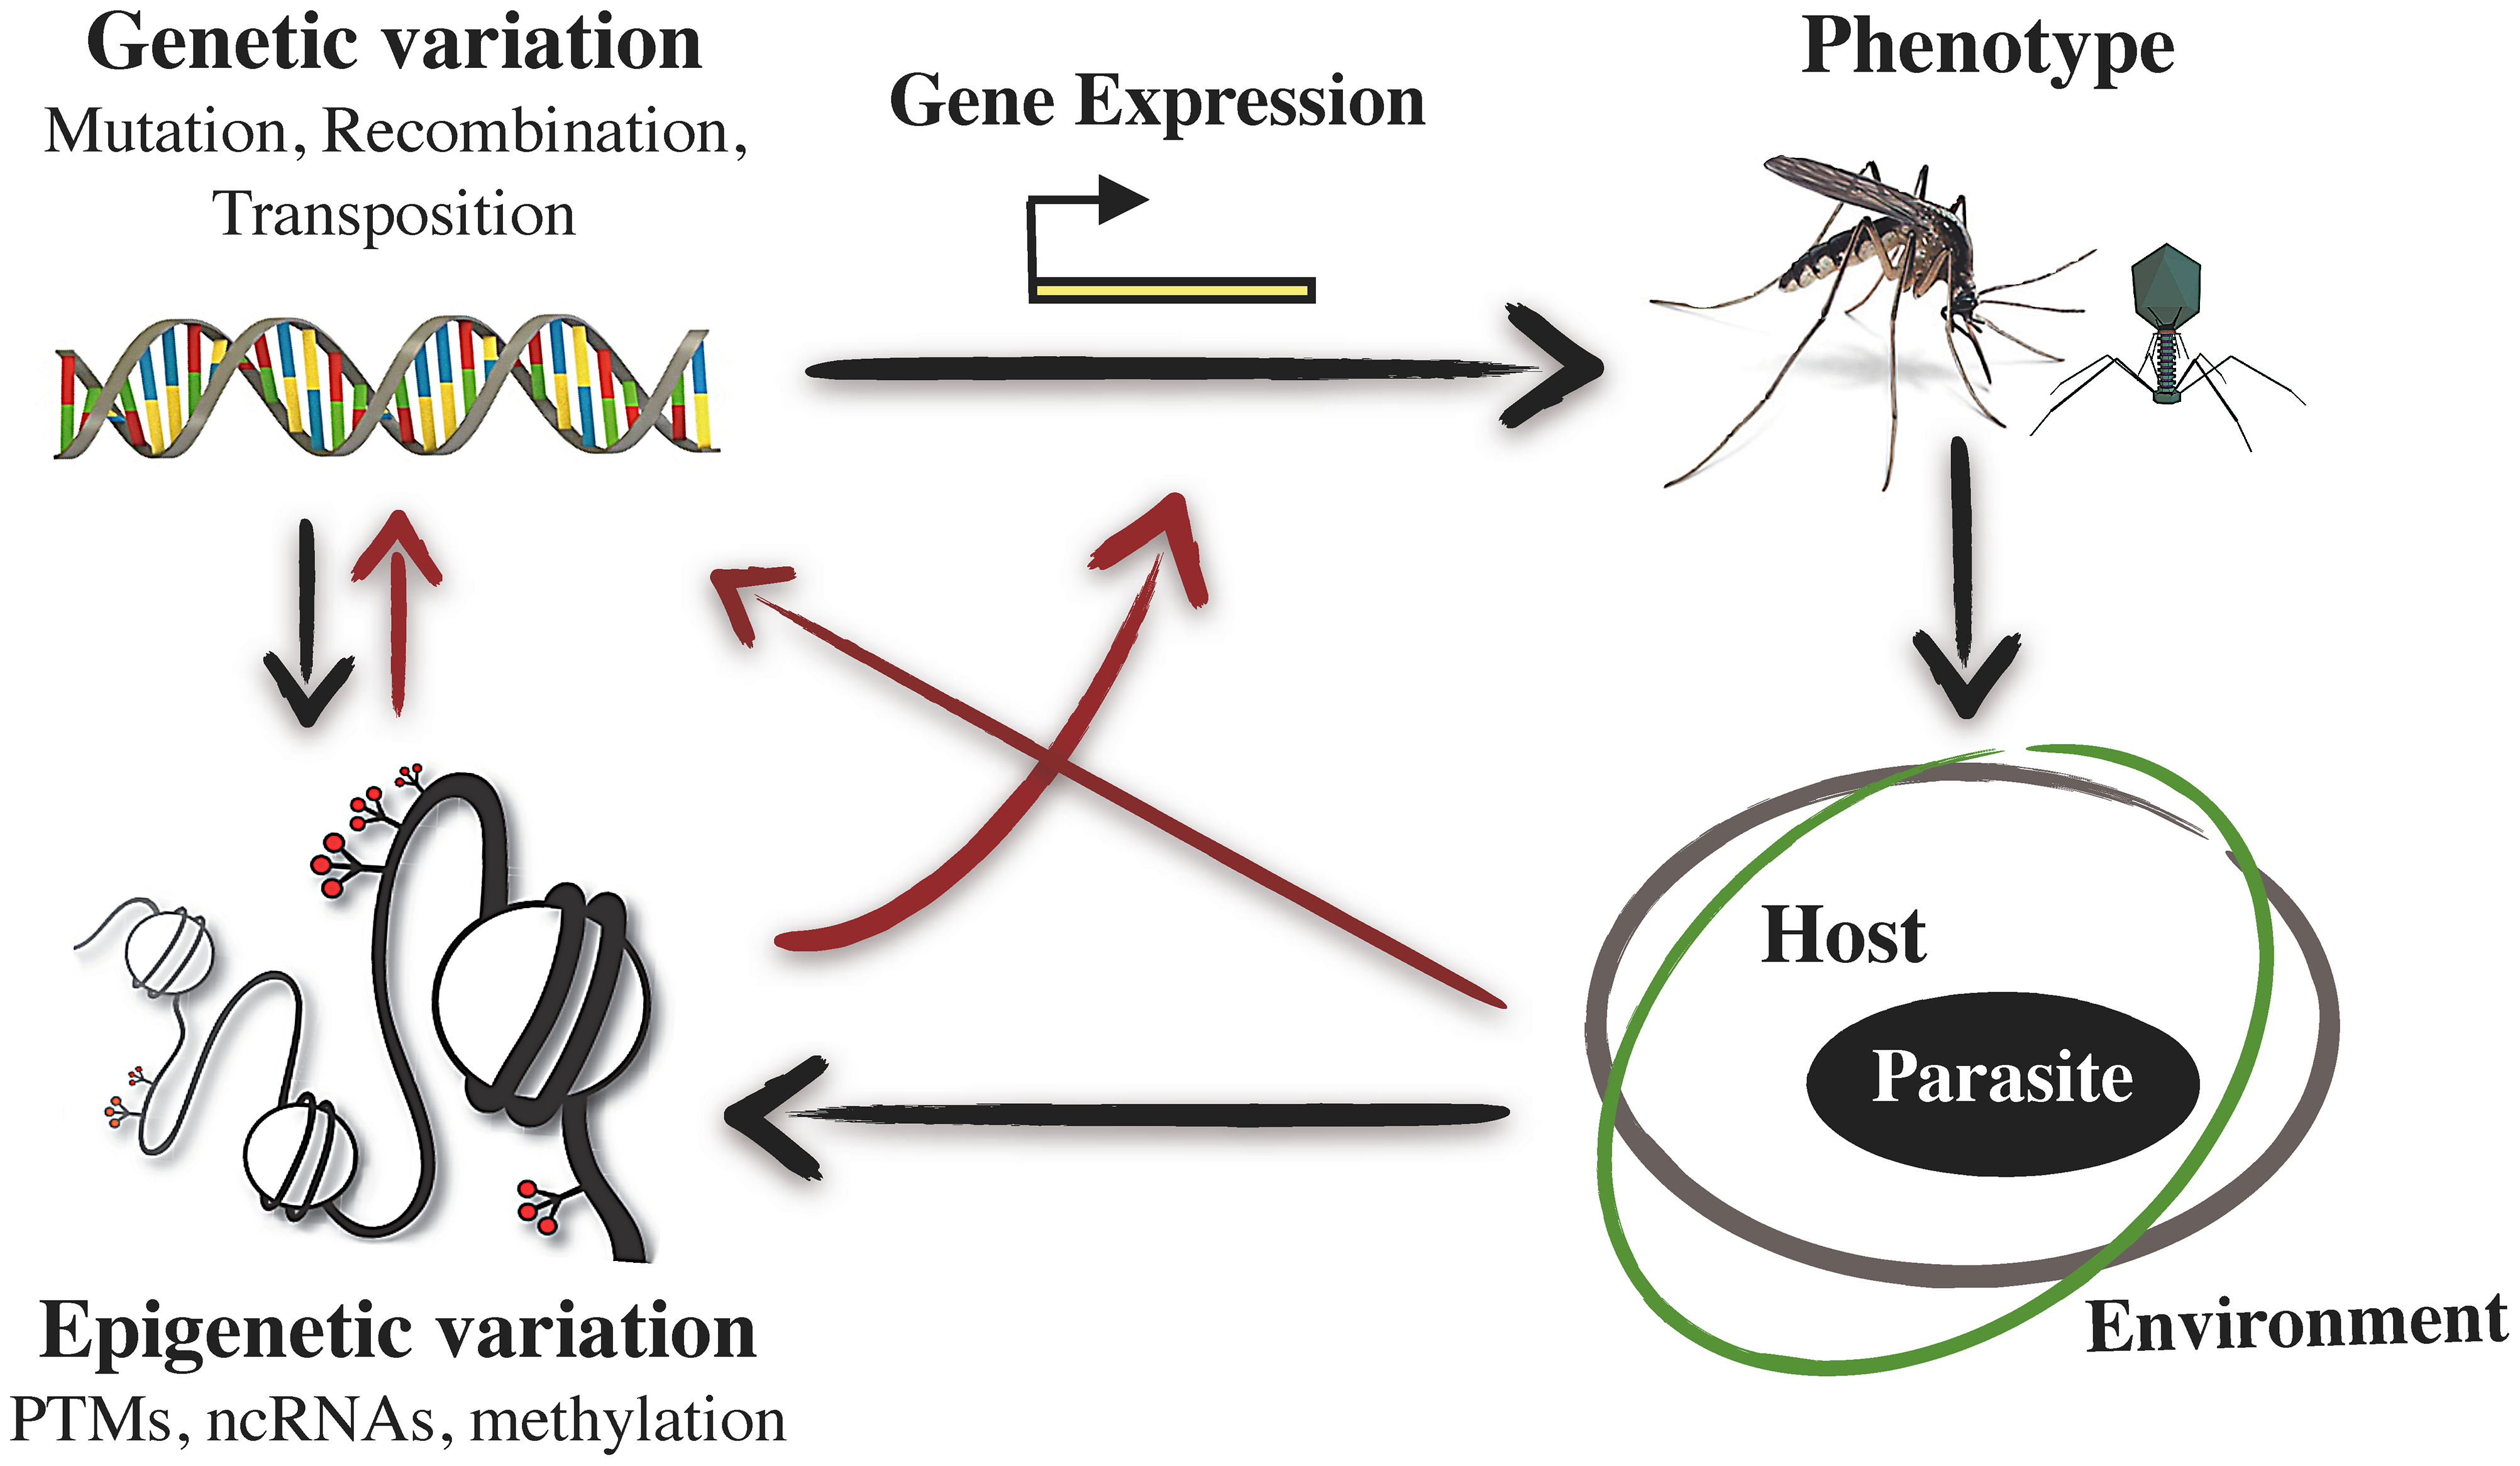 Schematic representation of the interrelations between epigenetic variation, phenotypic variation, and host–pathogen interactions.